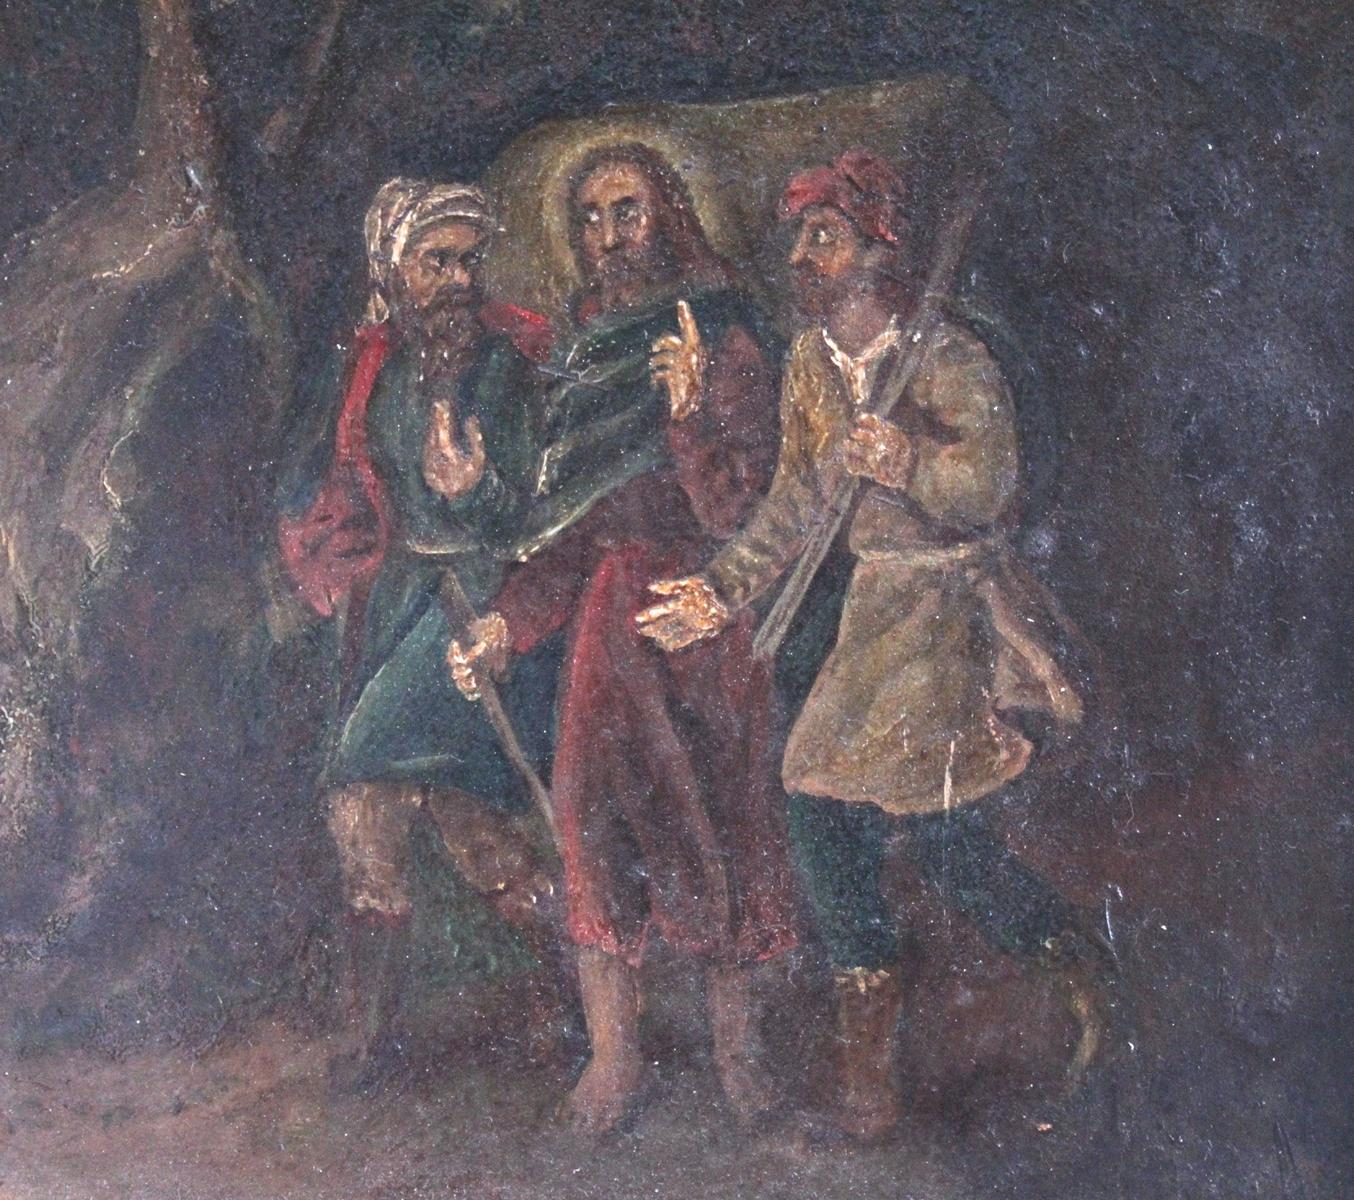 Religiöses Gemälde, 19. Jahrhundert. Unbekannter Künstler-4